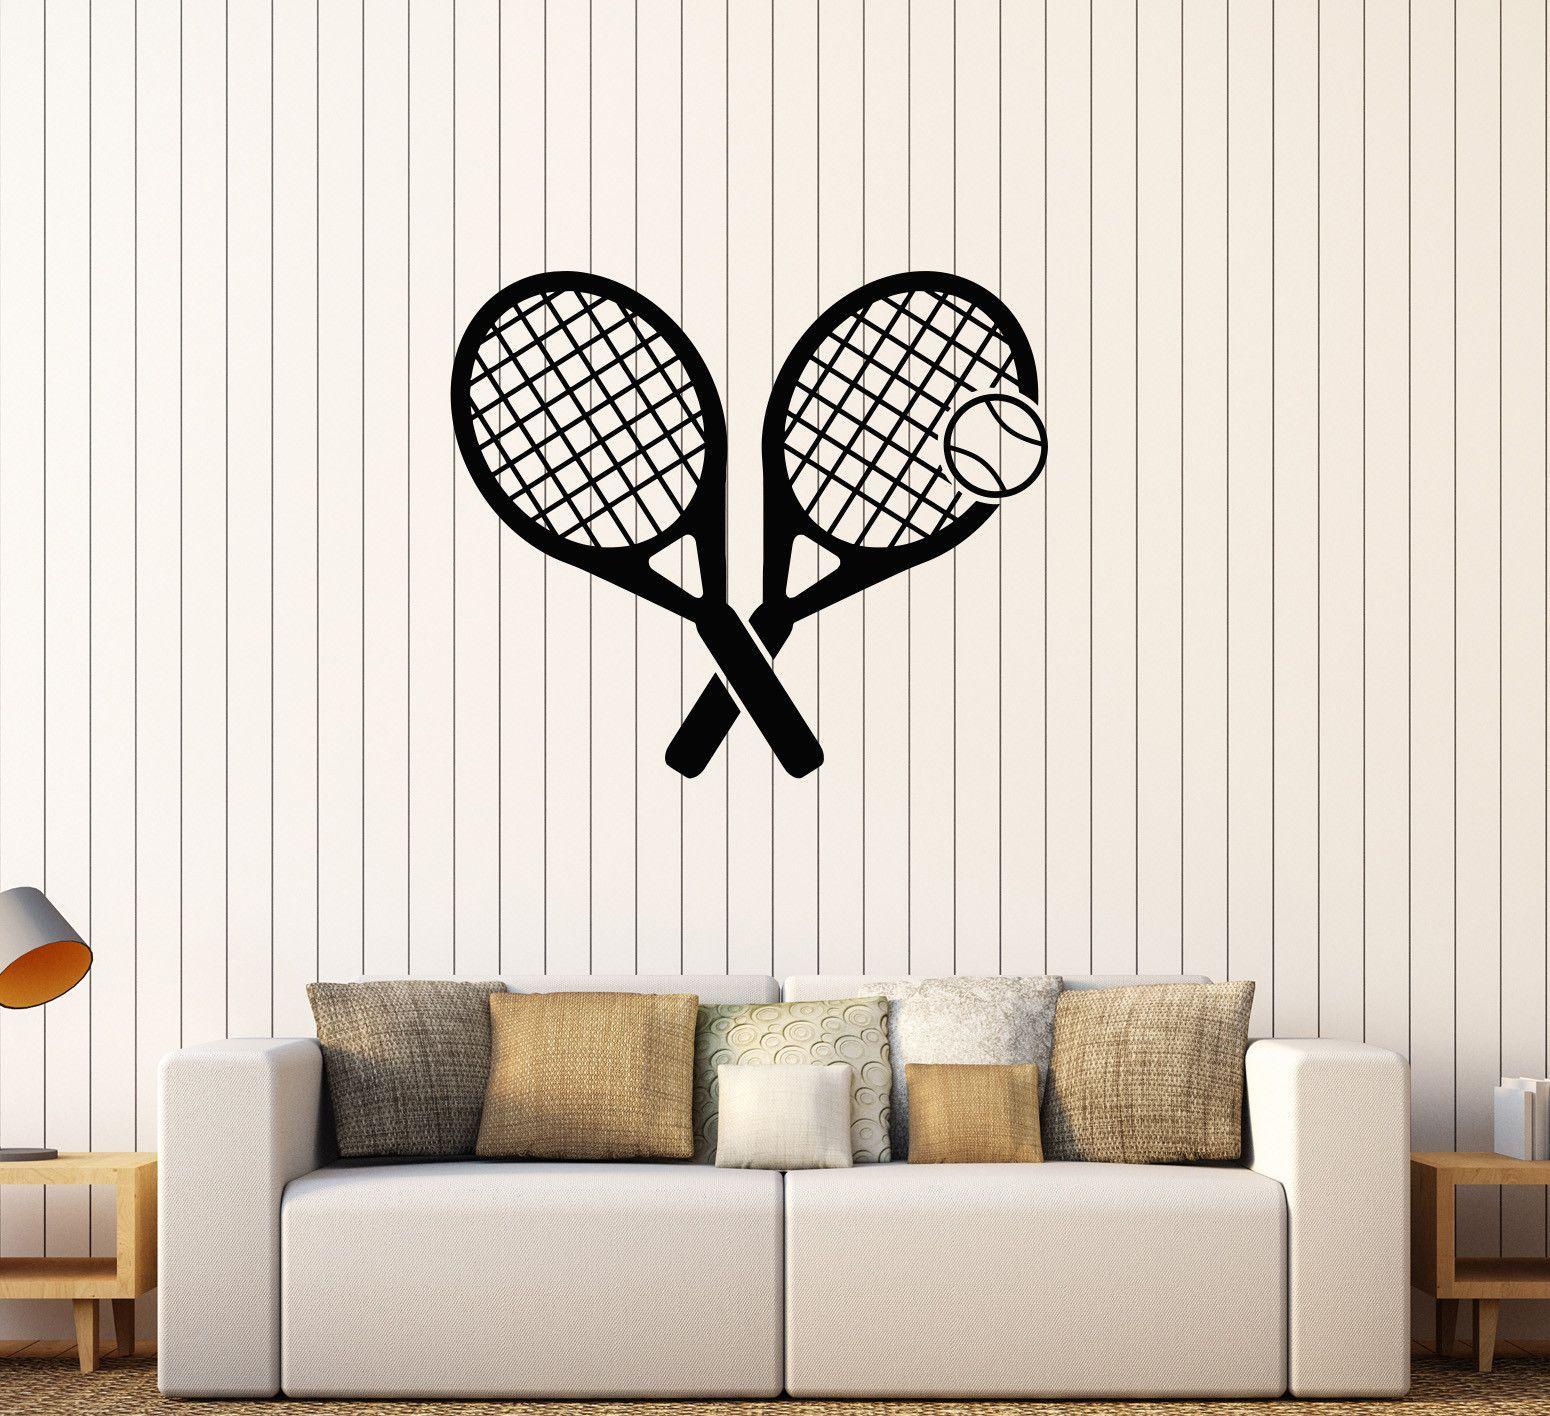 Vinyl Wall Decal Tennis Rocket Sport Game Stickers Mural (524ig)